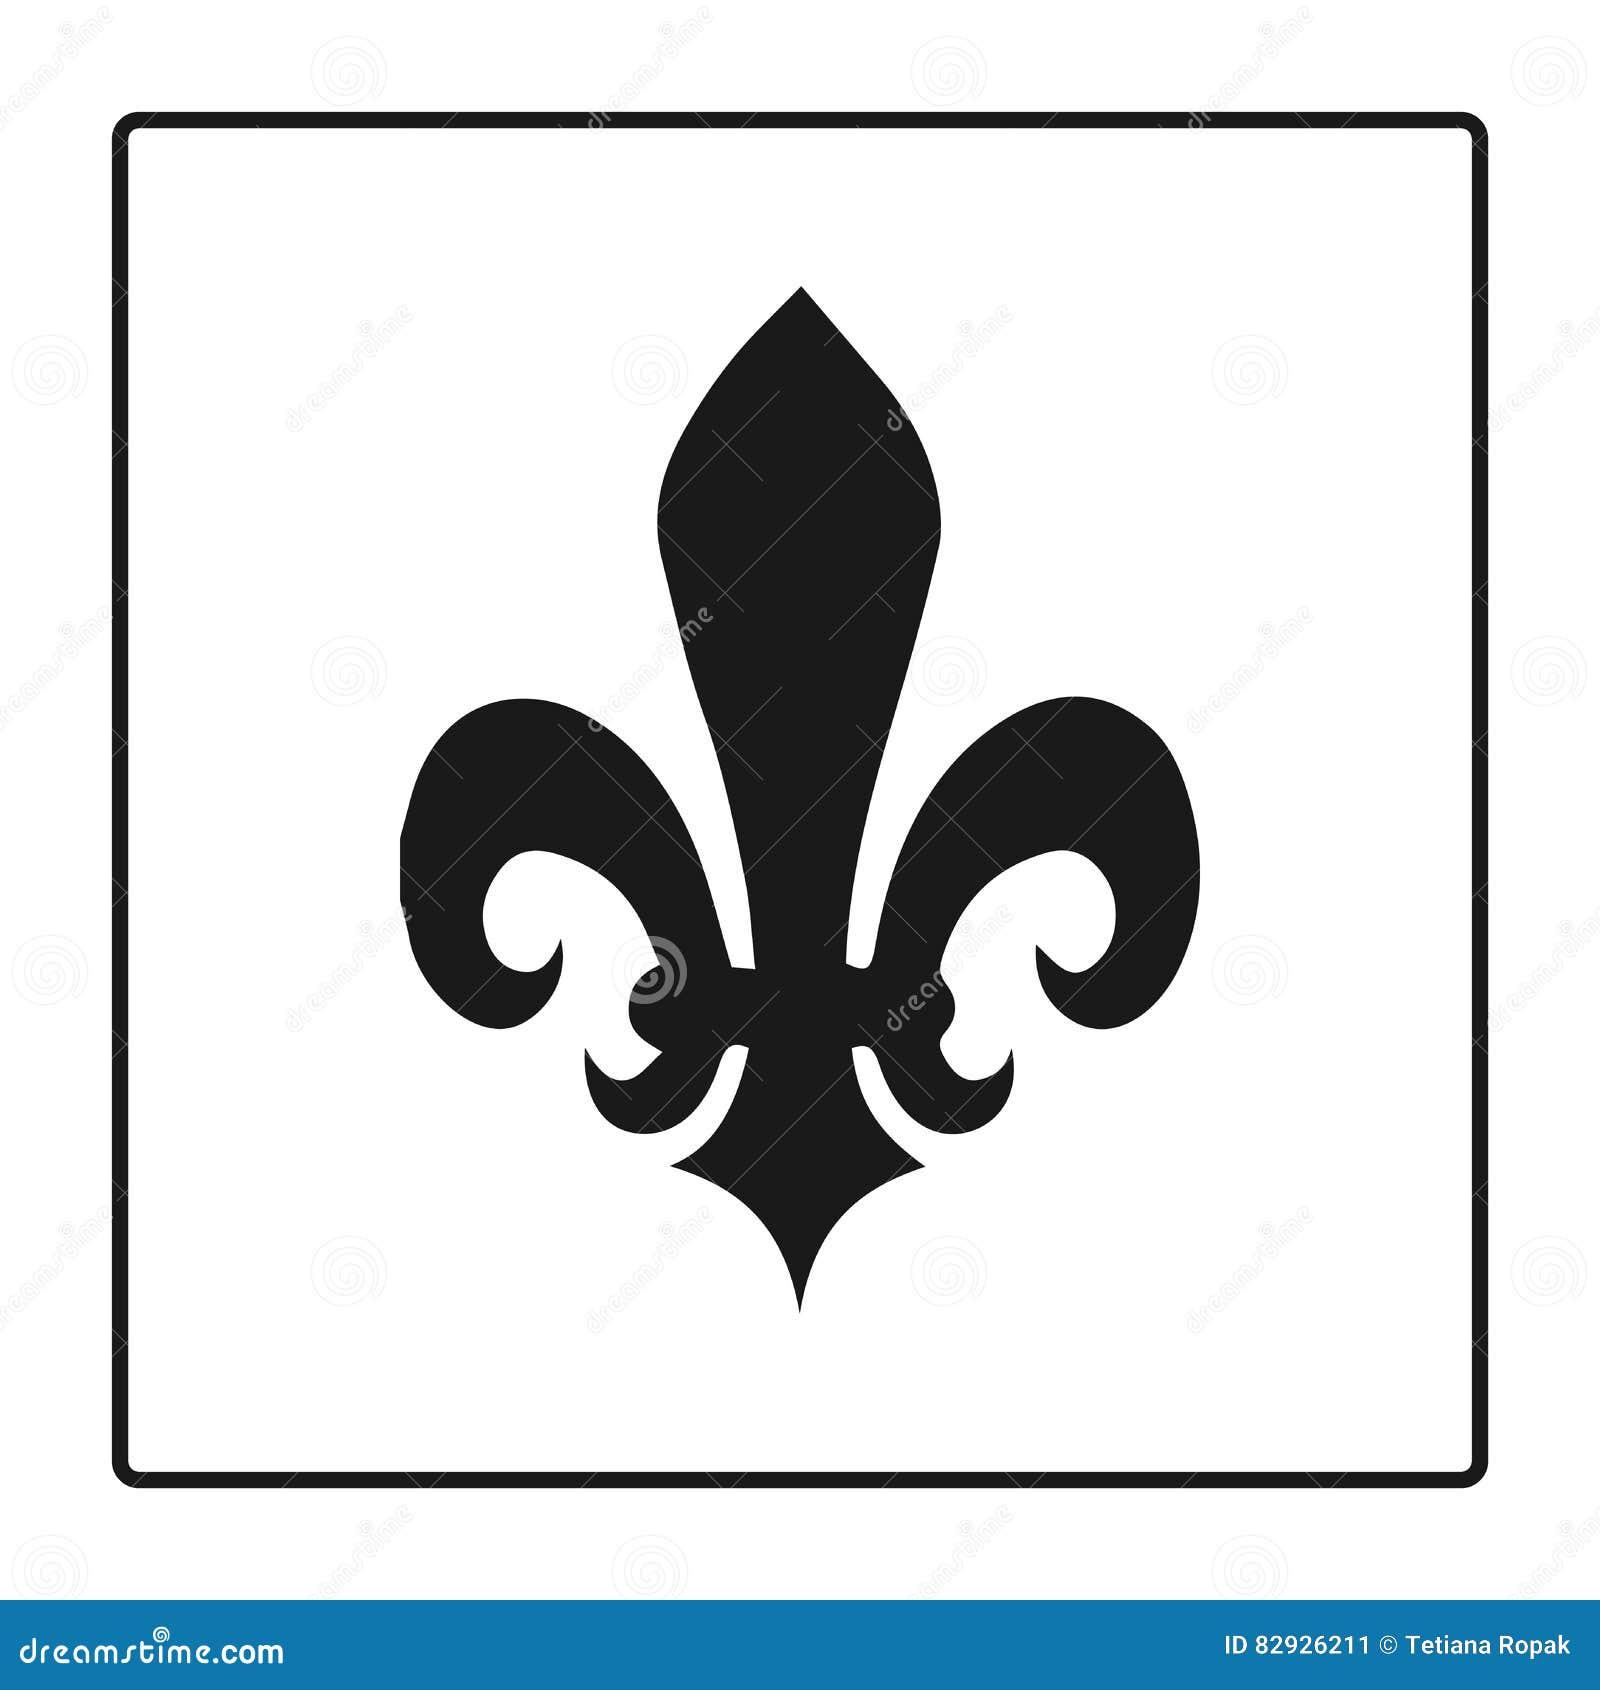 Fleur de lis symbol silhouette heraldic symbol vector fleur de lis symbol silhouette heraldic symbol vector illustration medieval sign glowing french fleur de lis royal lily ele biocorpaavc Gallery